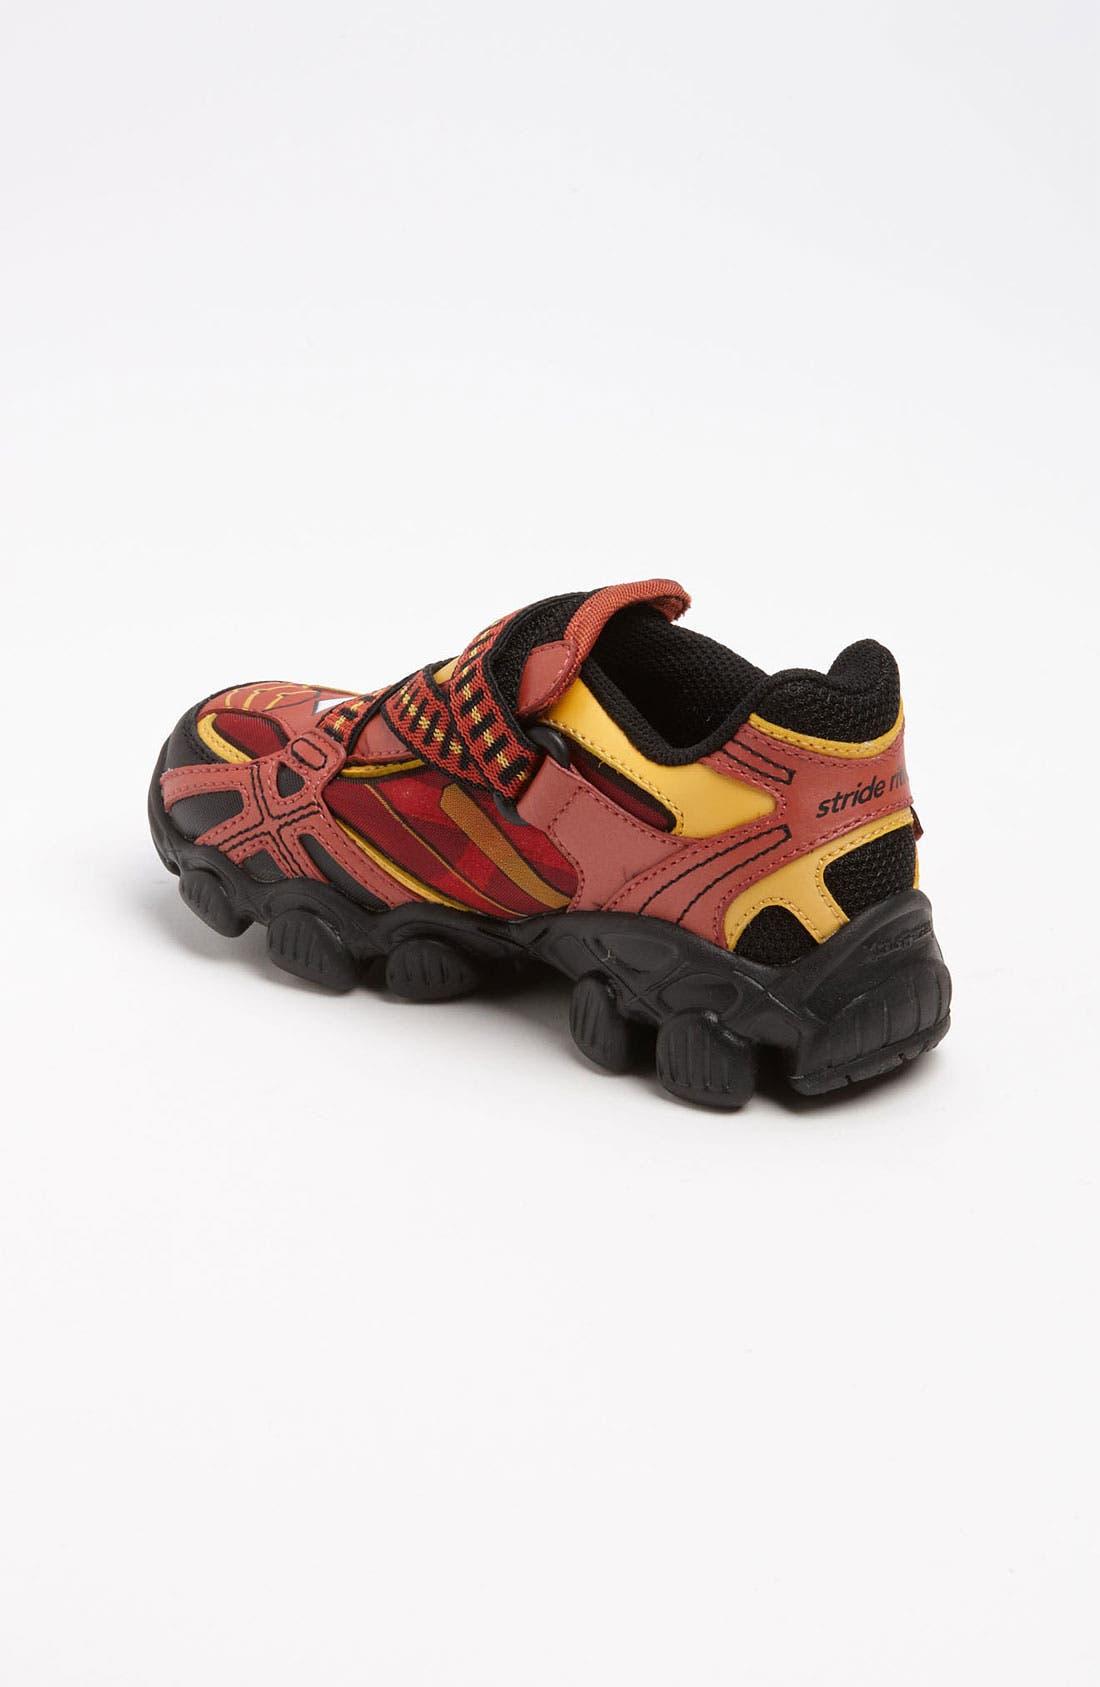 Alternate Image 2  - Stride Ride 'X-Celeracers Iron Man®' Sneaker (Toddler & Little Kid)